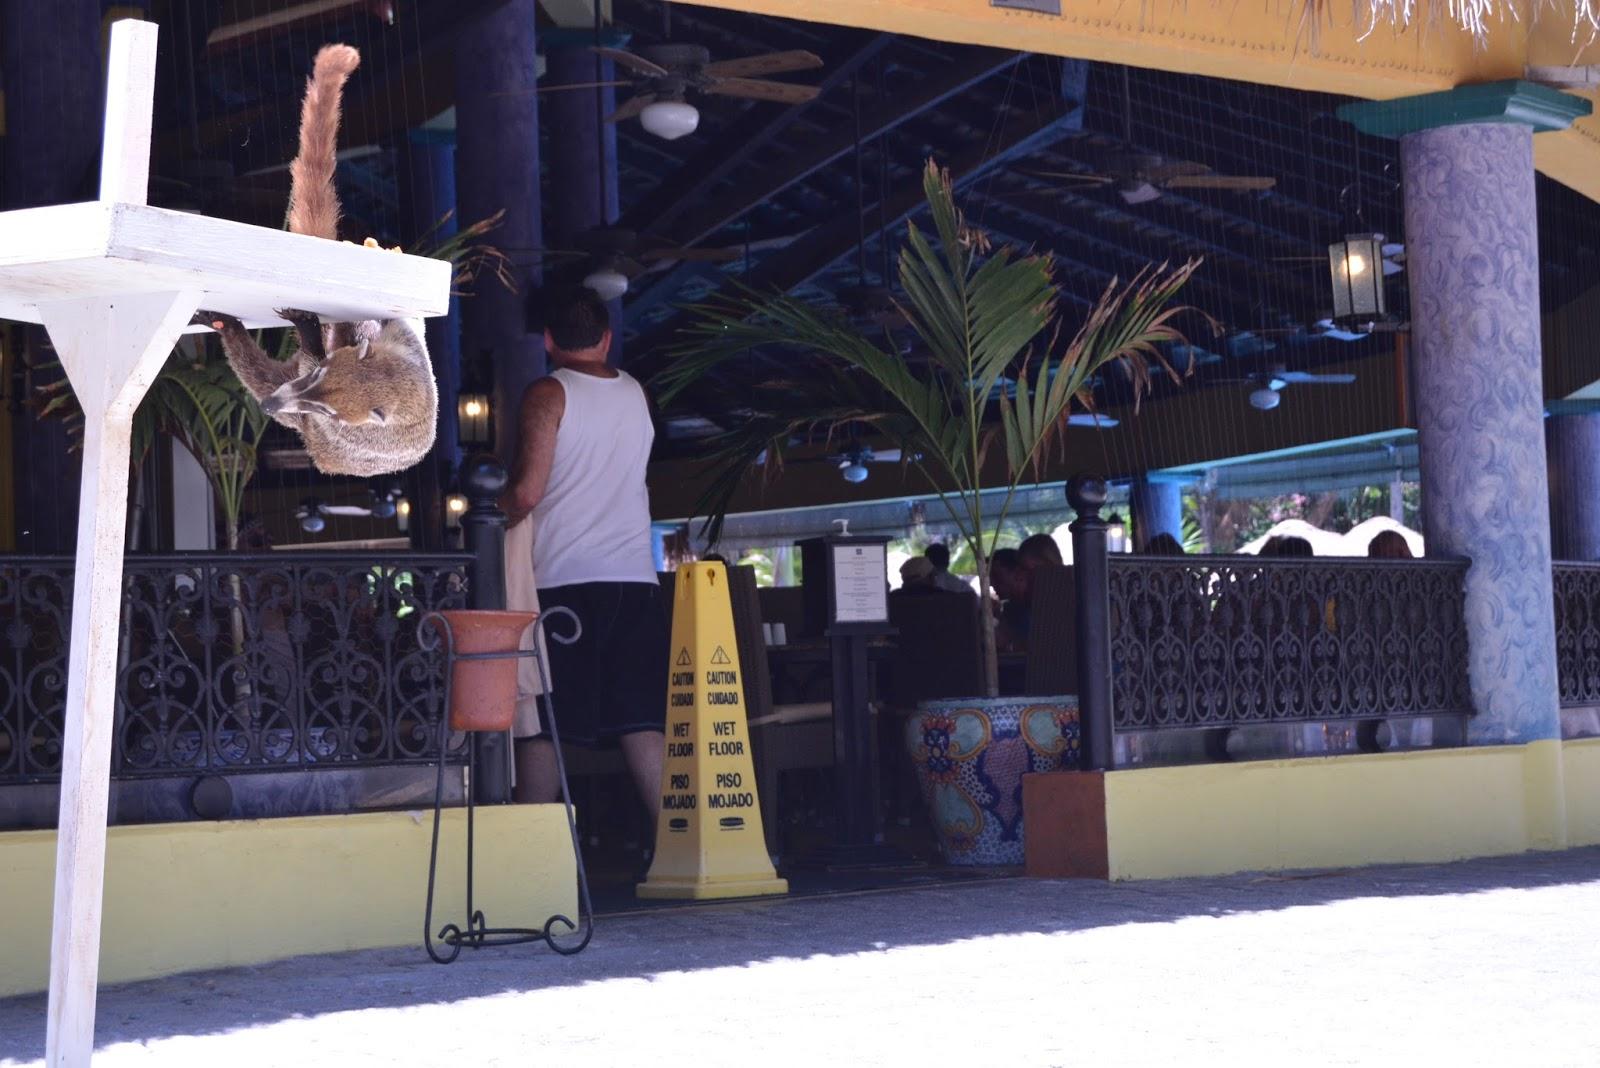 coati, nature, wildlife, photography, mexico, travel, traveling, holiday, playa del carmen